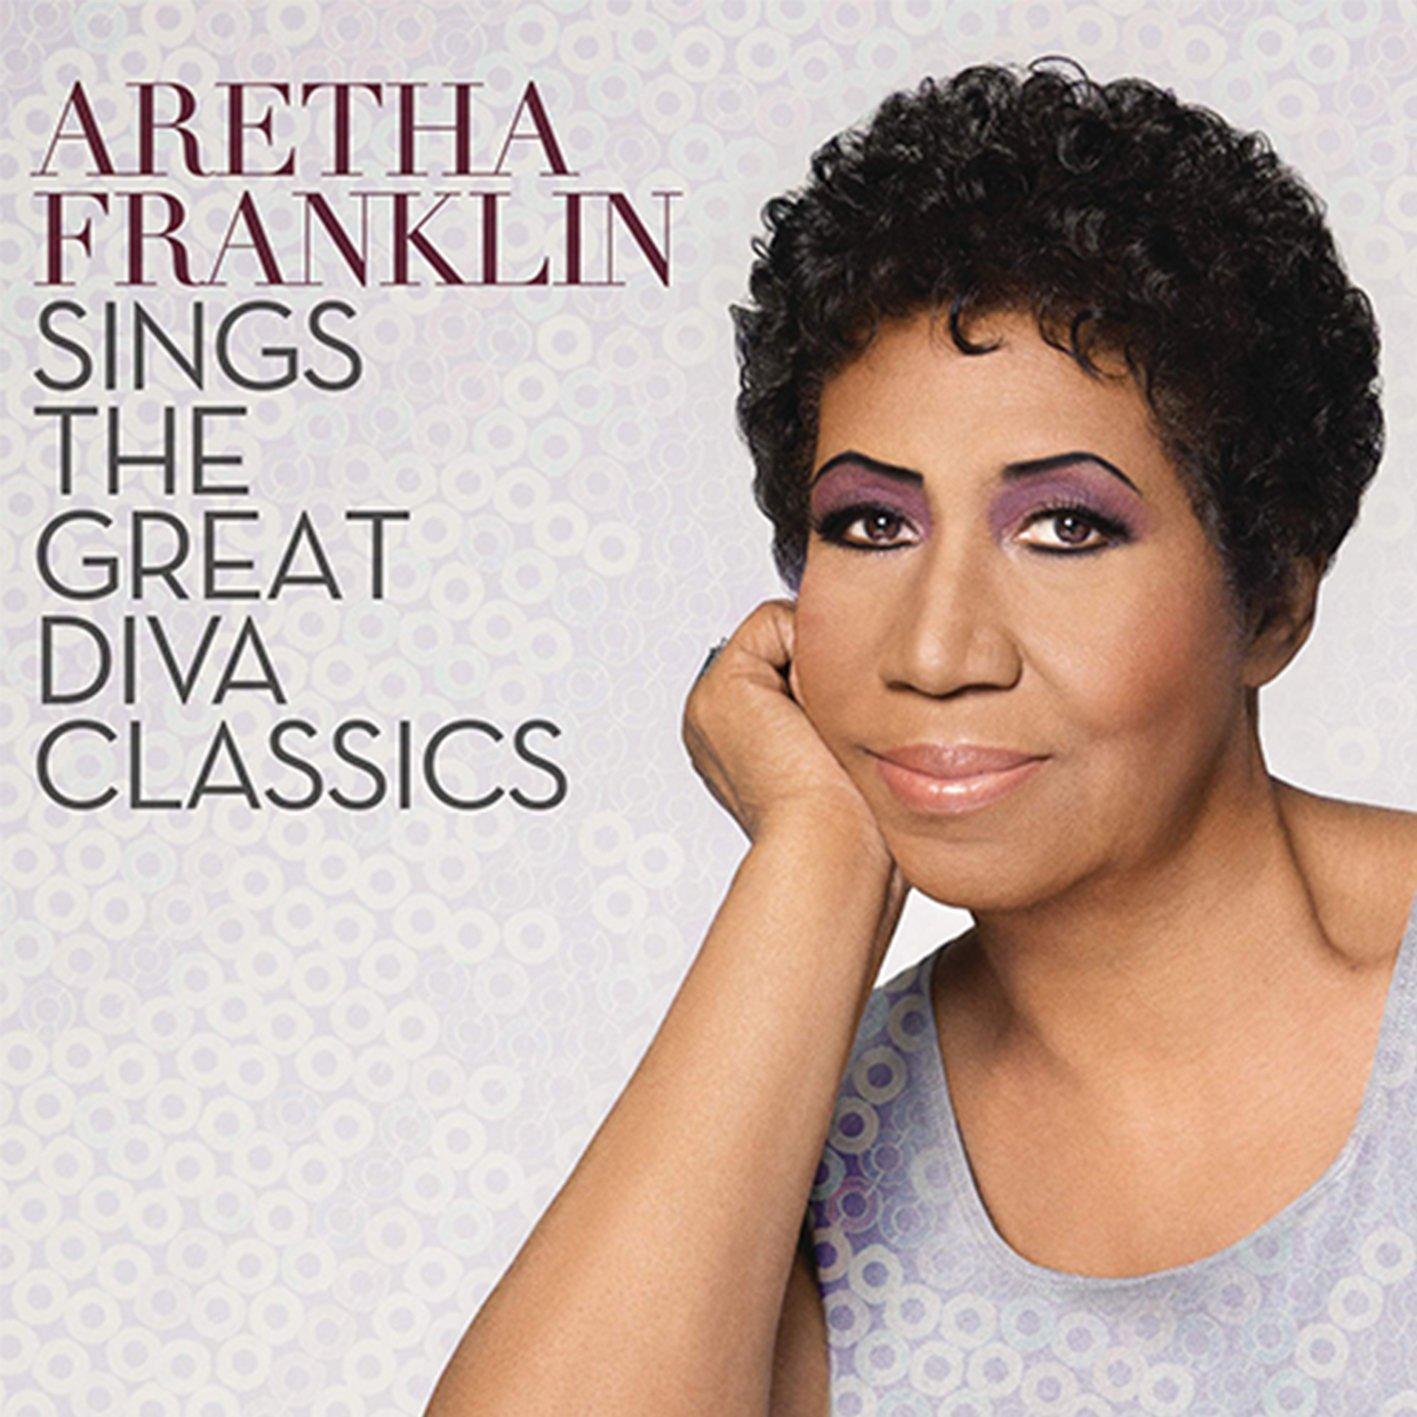 Aretha FranklinВиниловые пластинки<br>Виниловая пластинка<br>